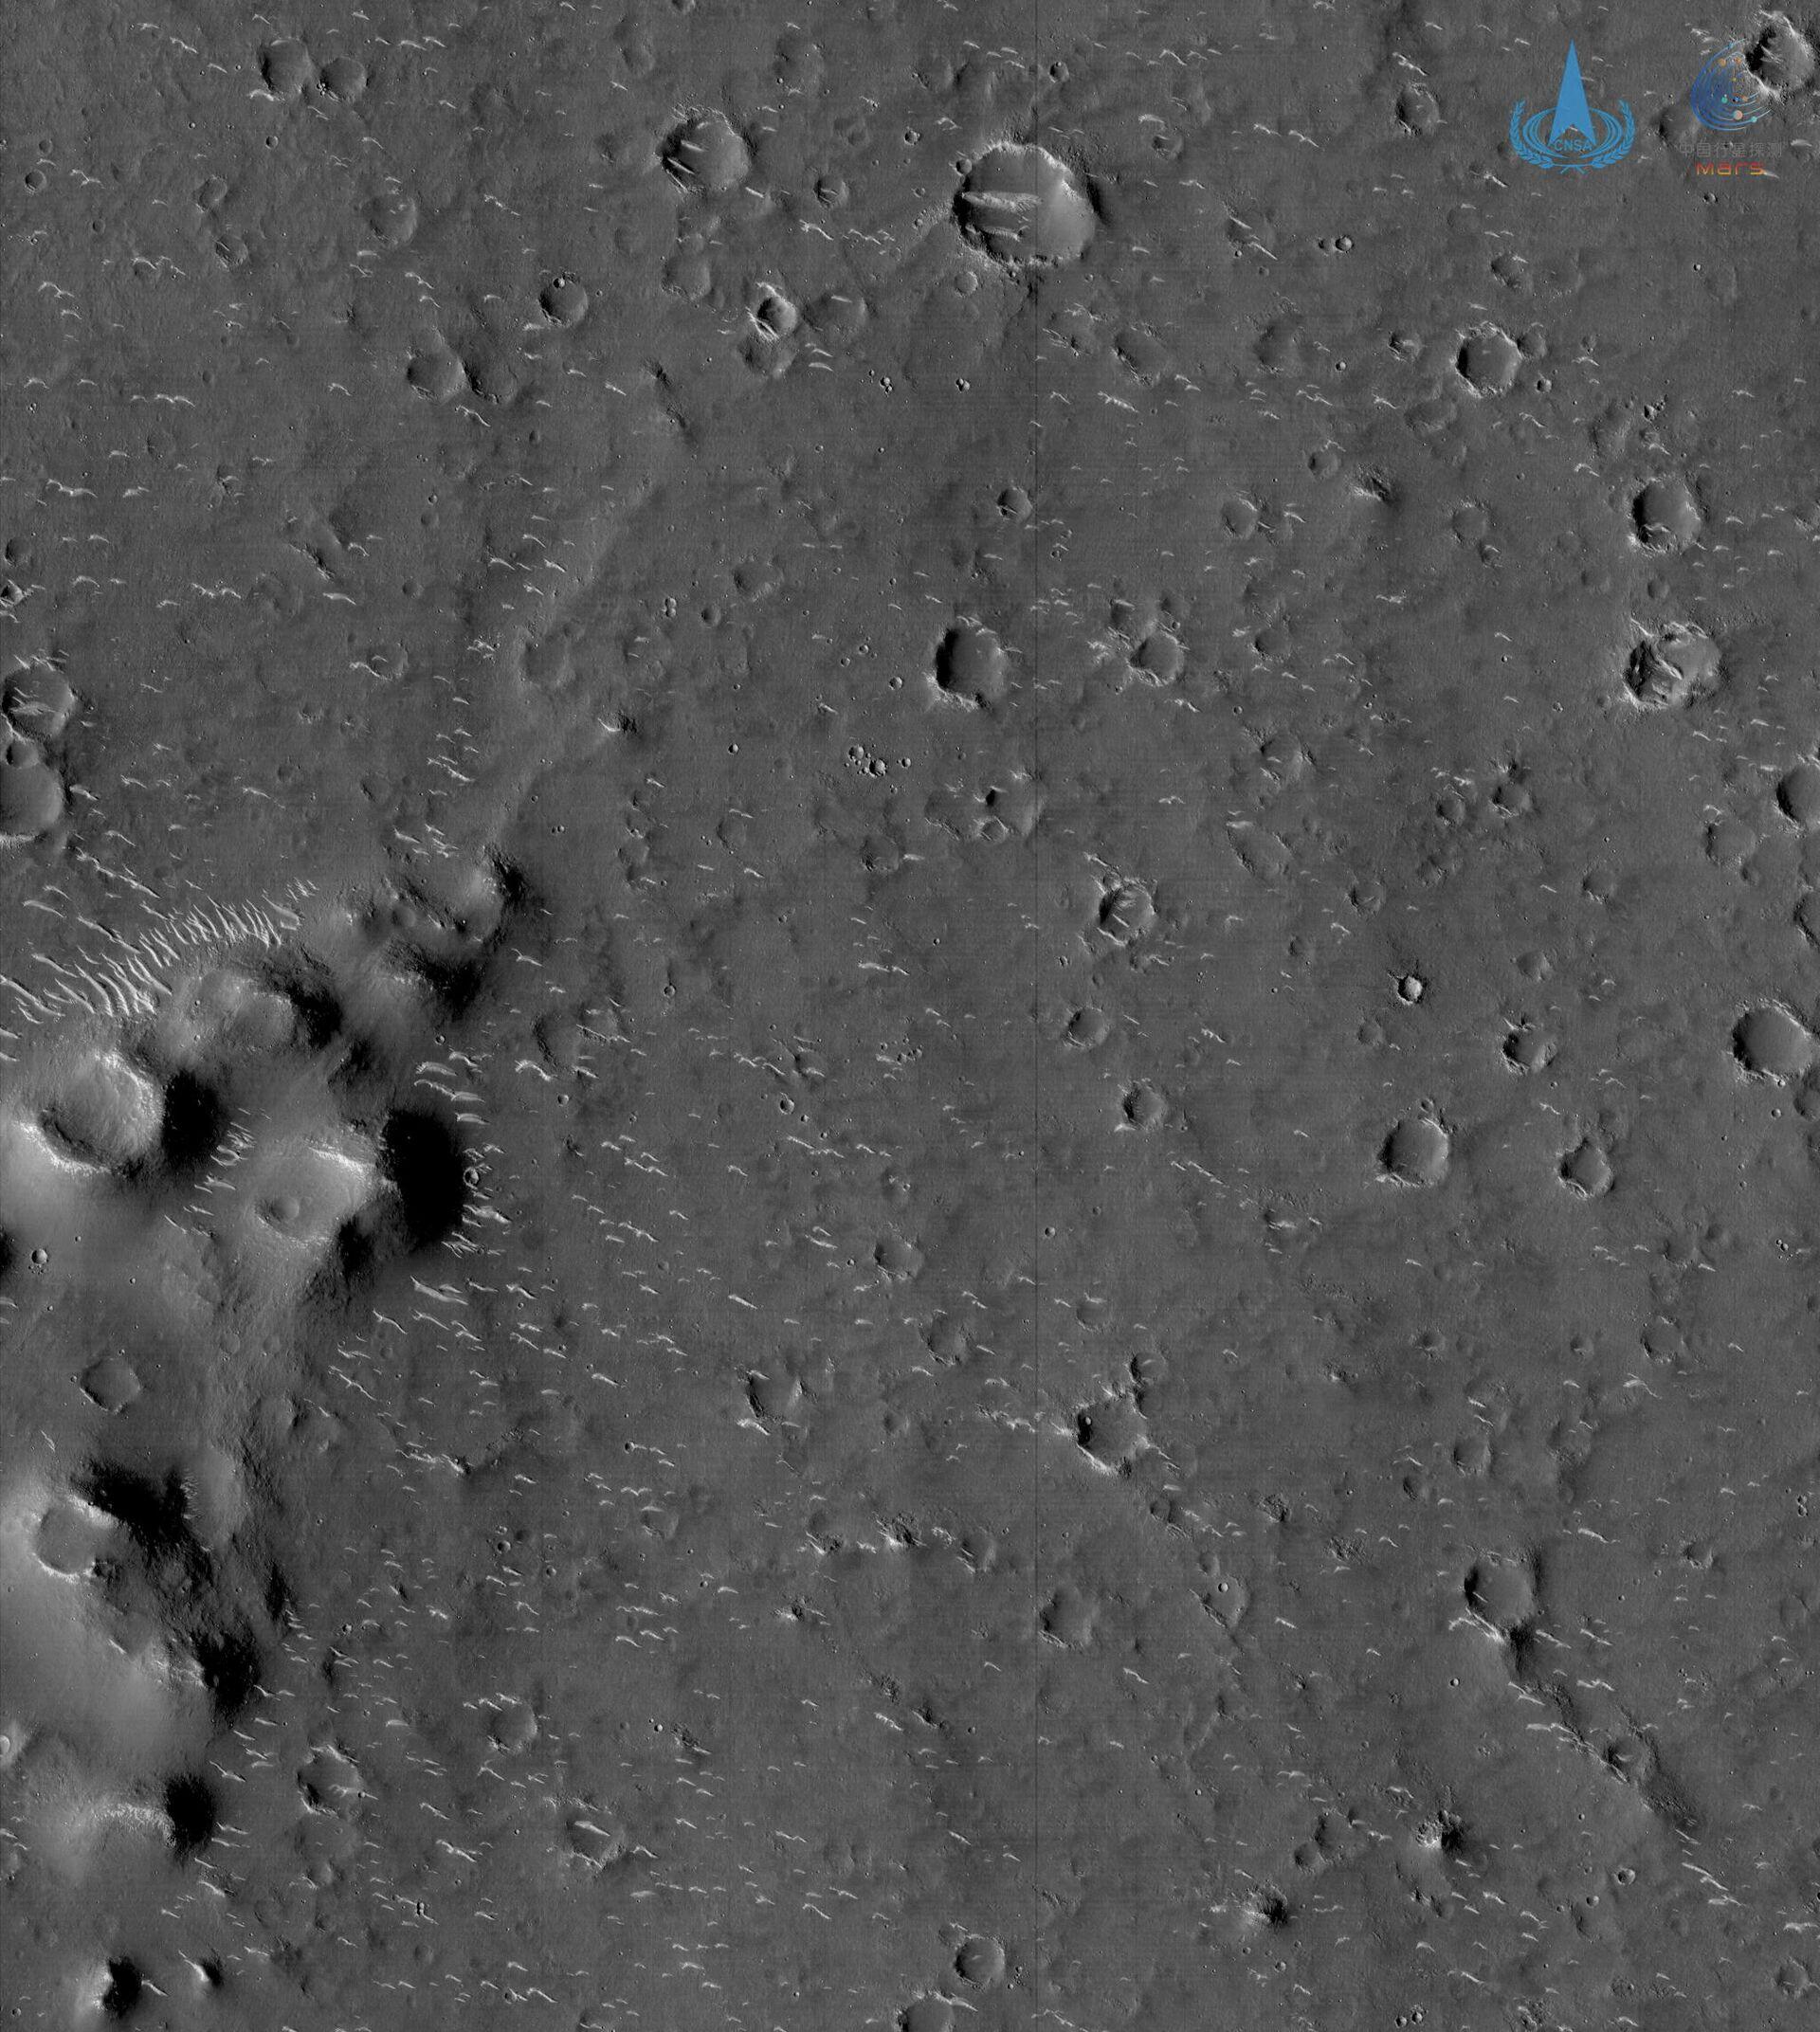 Marte fotografiado por la sonda espacial Tianwen 1 - Sputnik Mundo, 1920, 05.03.2021